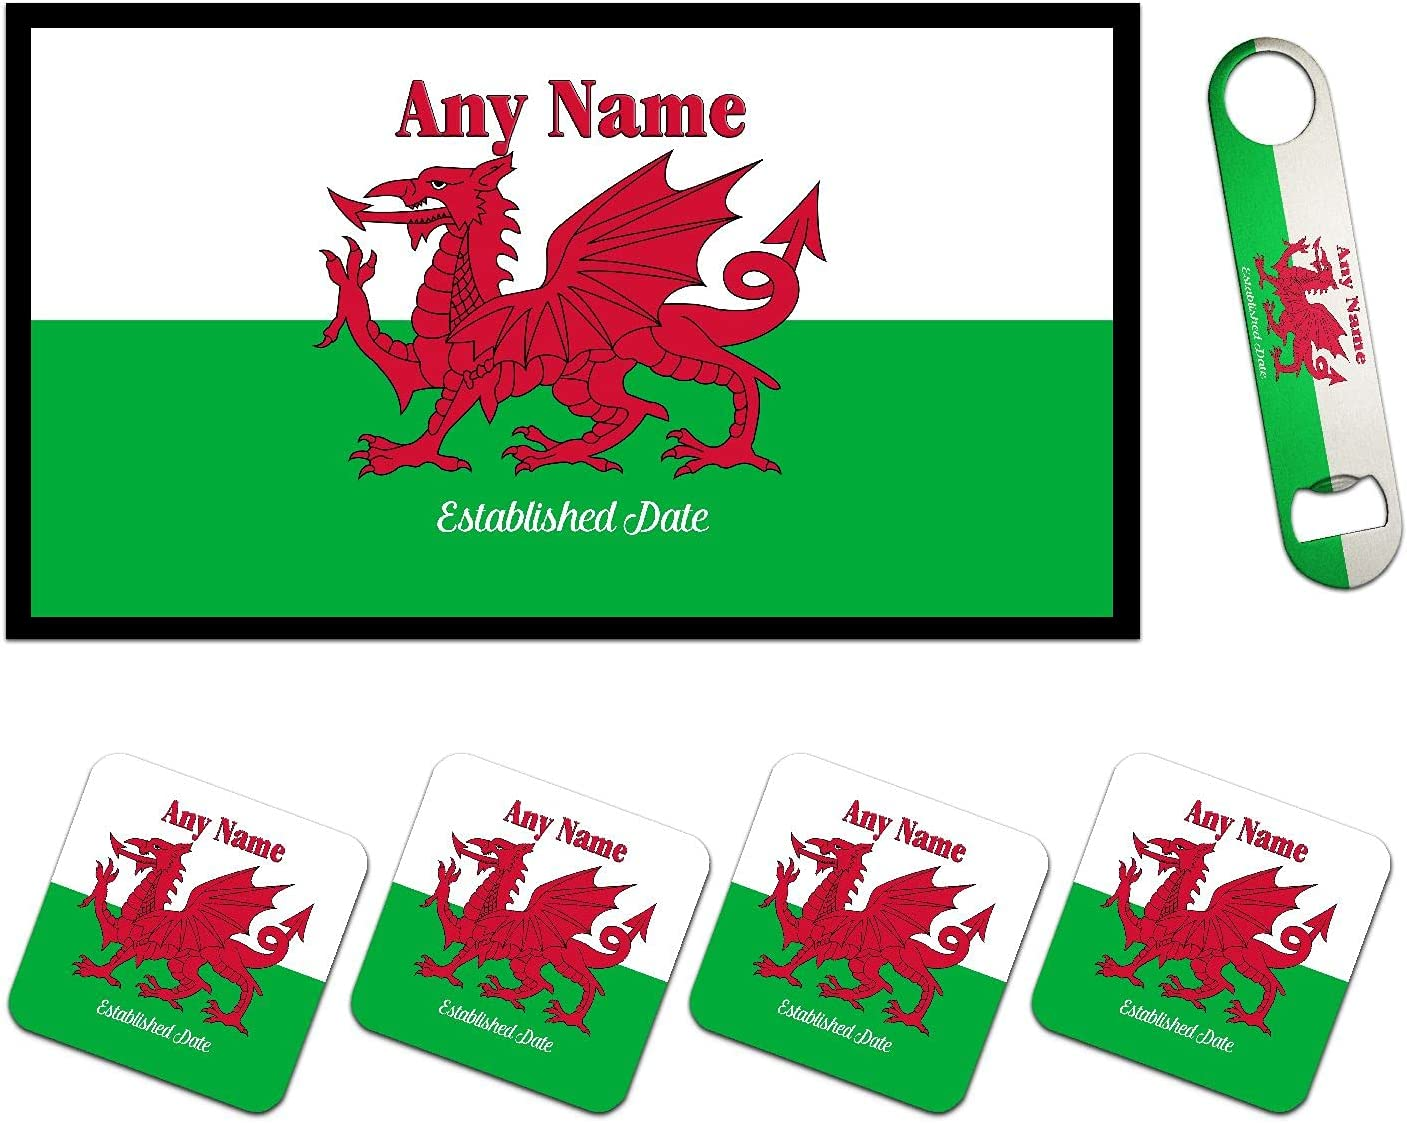 Personalized Cheap mail order sales Flag of Wales Cymru Y Ddraig Welsh Cash special price Goch Red Dragon